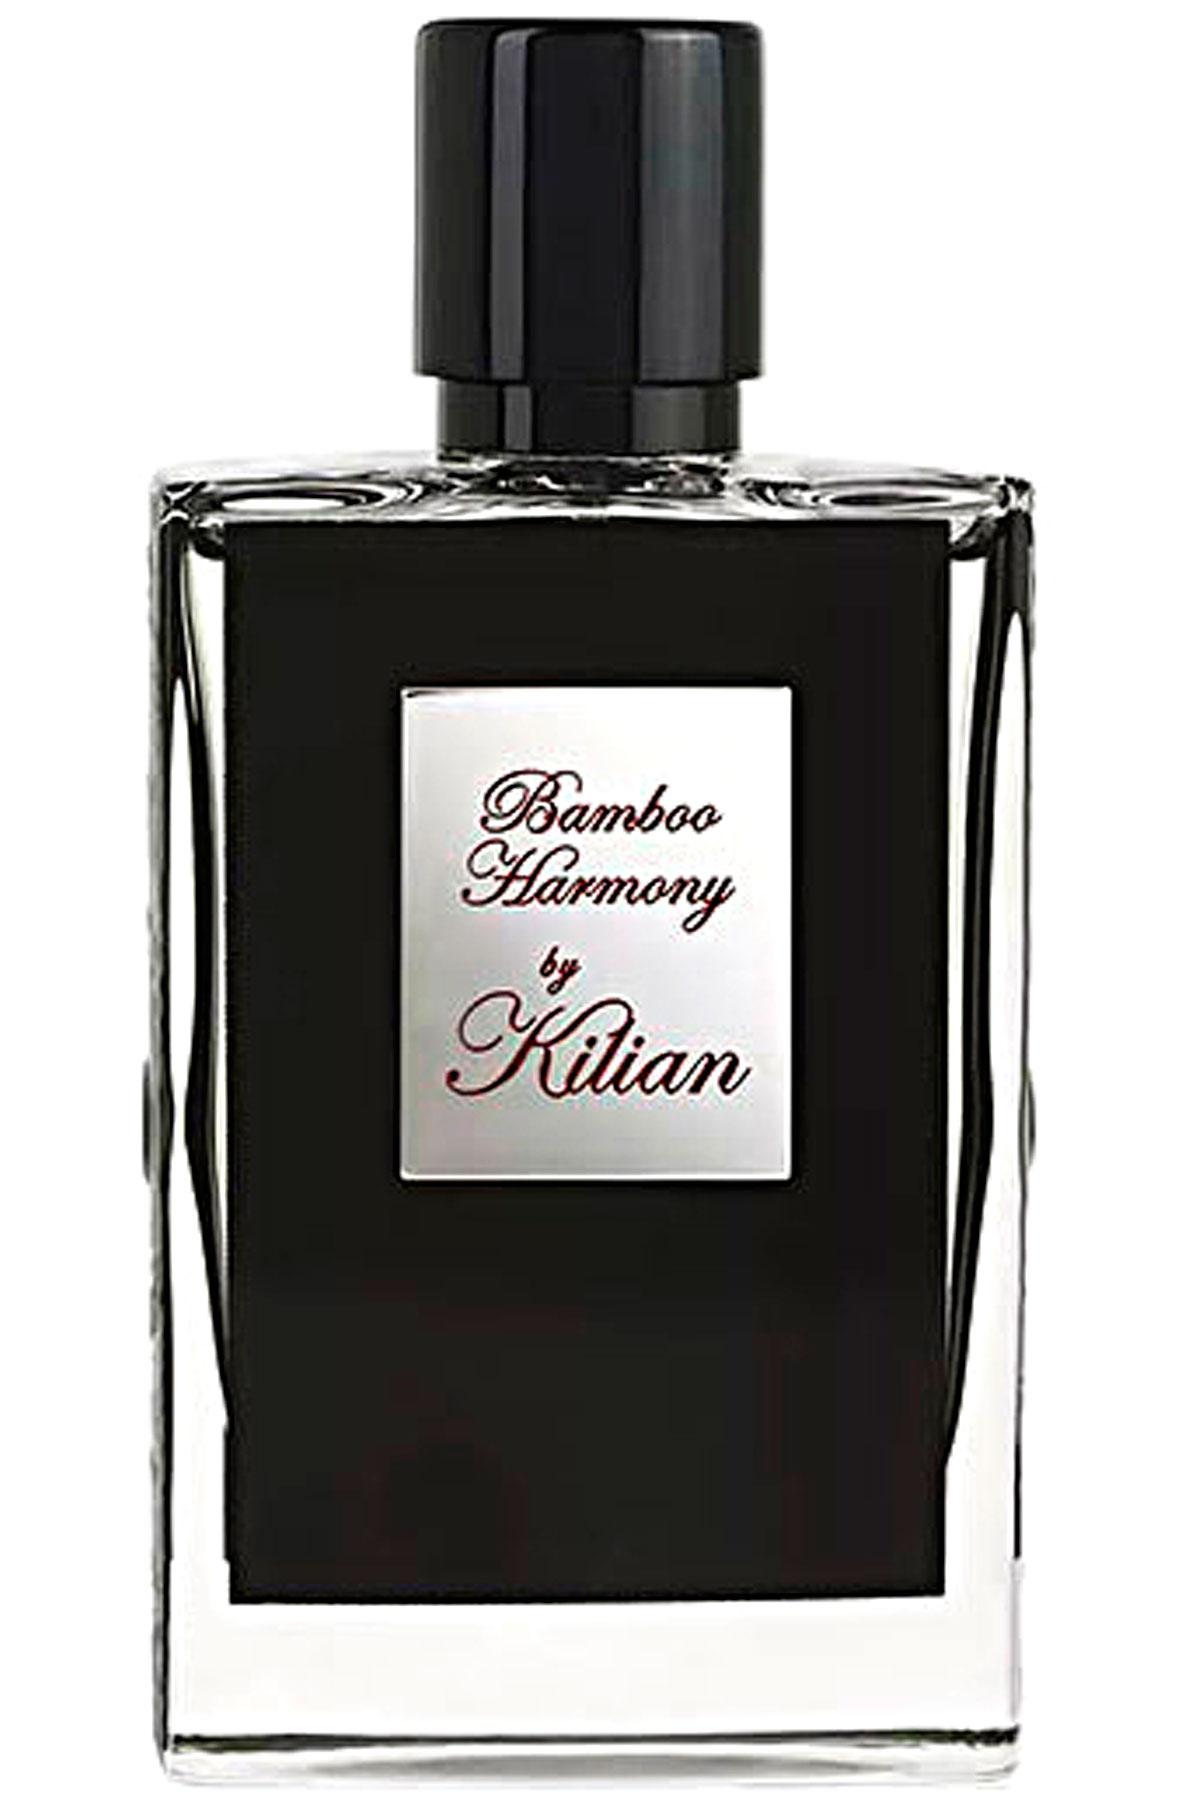 Kilian Fragrances for Women, Bamboo Harmony - Eau De Parfum - 50 Ml, 2019, 50 ml